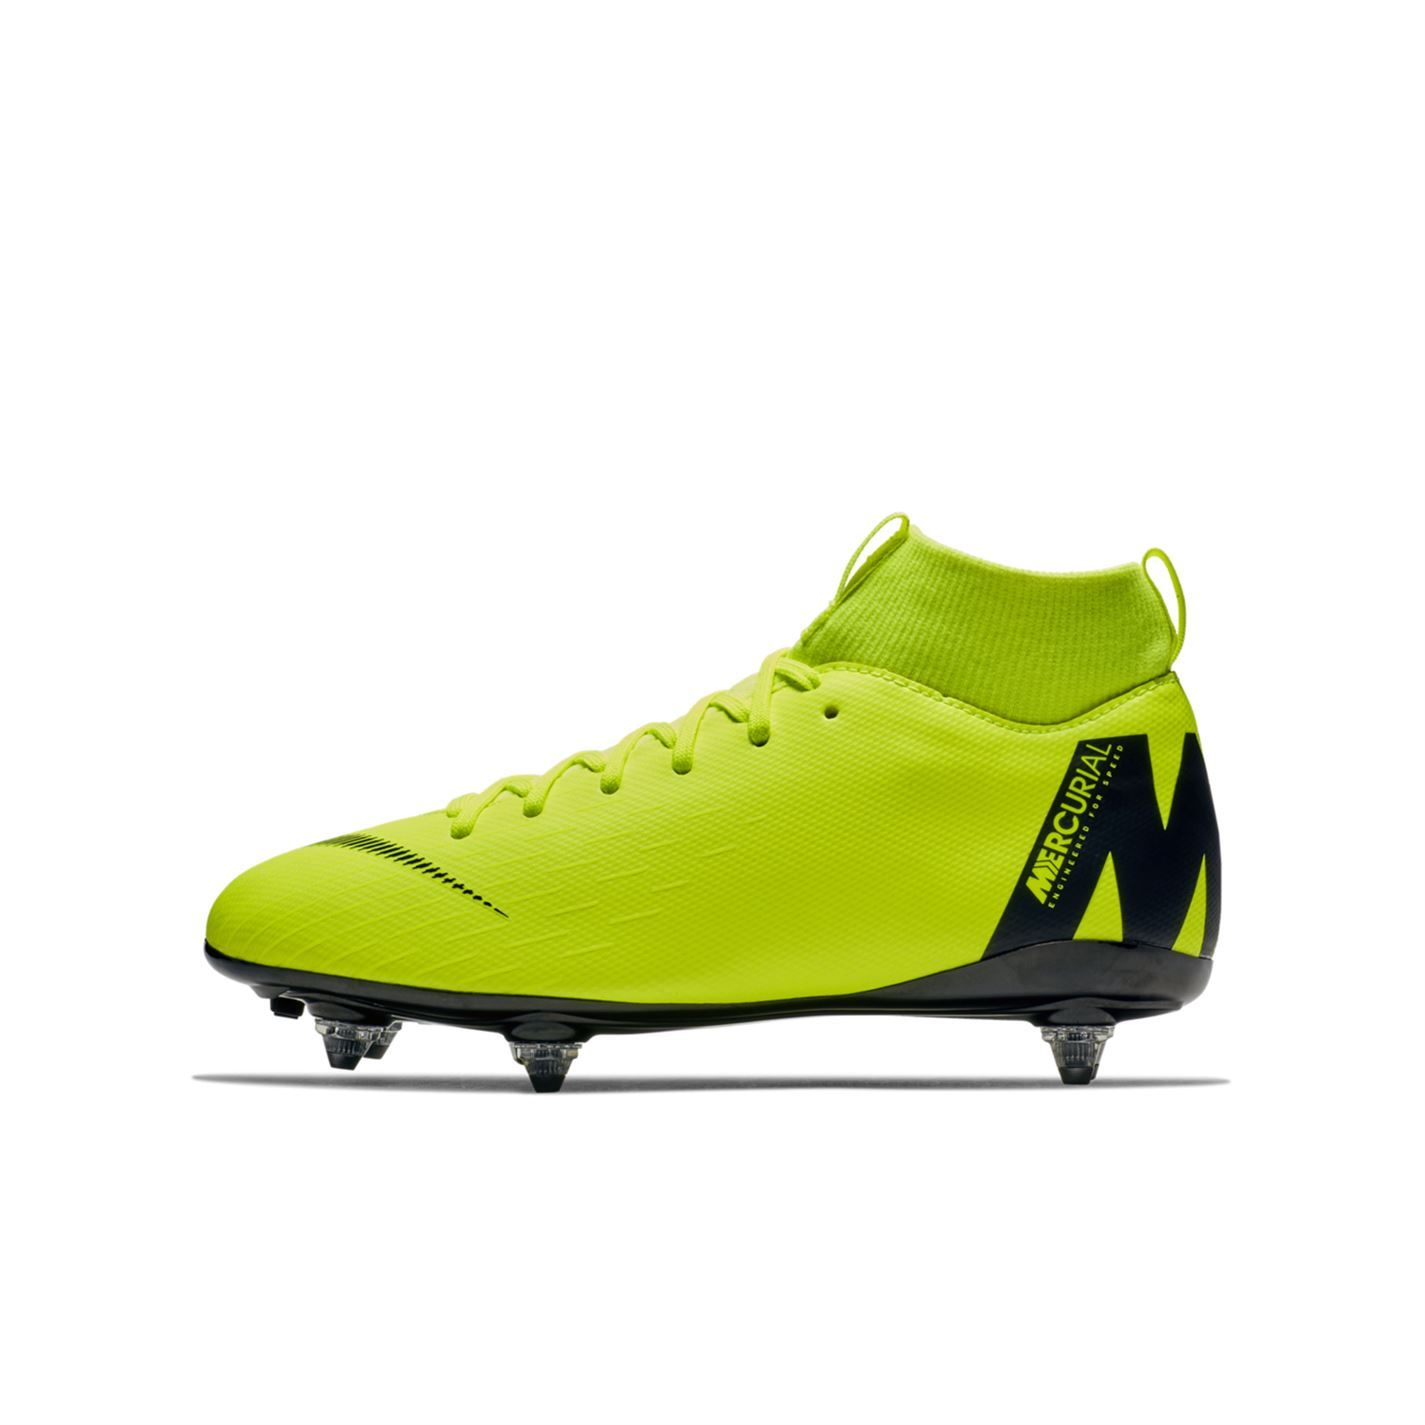 81e5eaa2df ... Botas de Nike Mercurial Superfly Academia tierra suave futbol Juniors  Futbol tacos